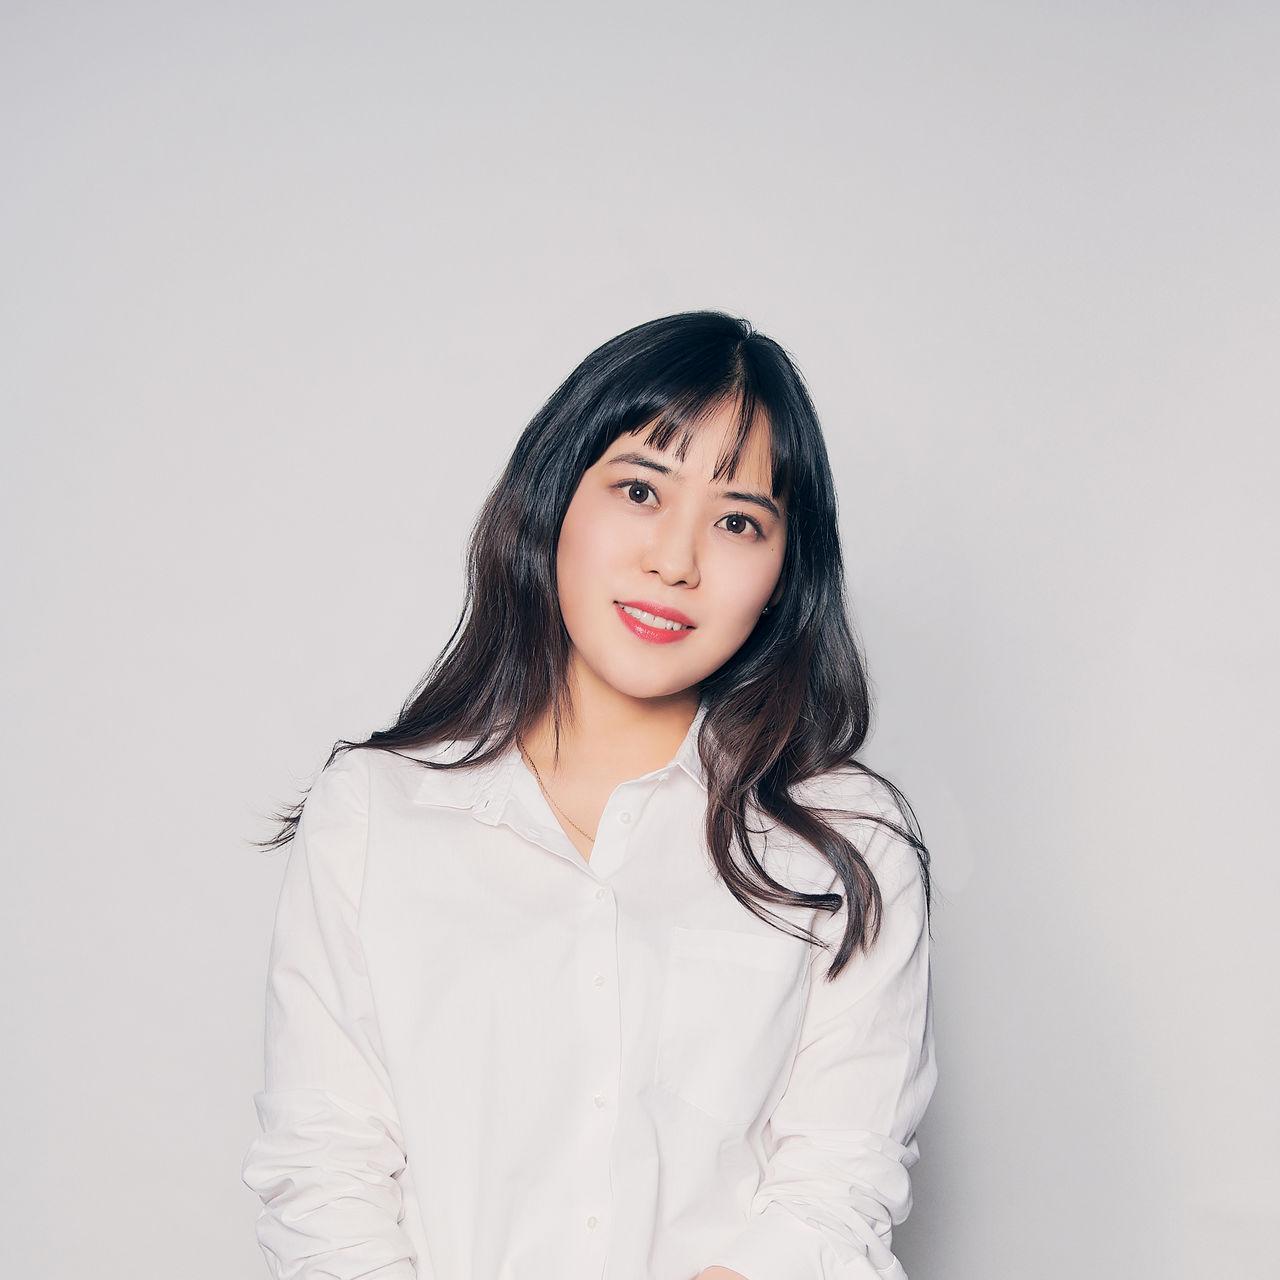 "<b>Kwak Seong Eun</b><br><span style=""letter-spacing: -1px; font-size: 14px; color: rgb(113, 113, 113);"">Lead Associate<br>"